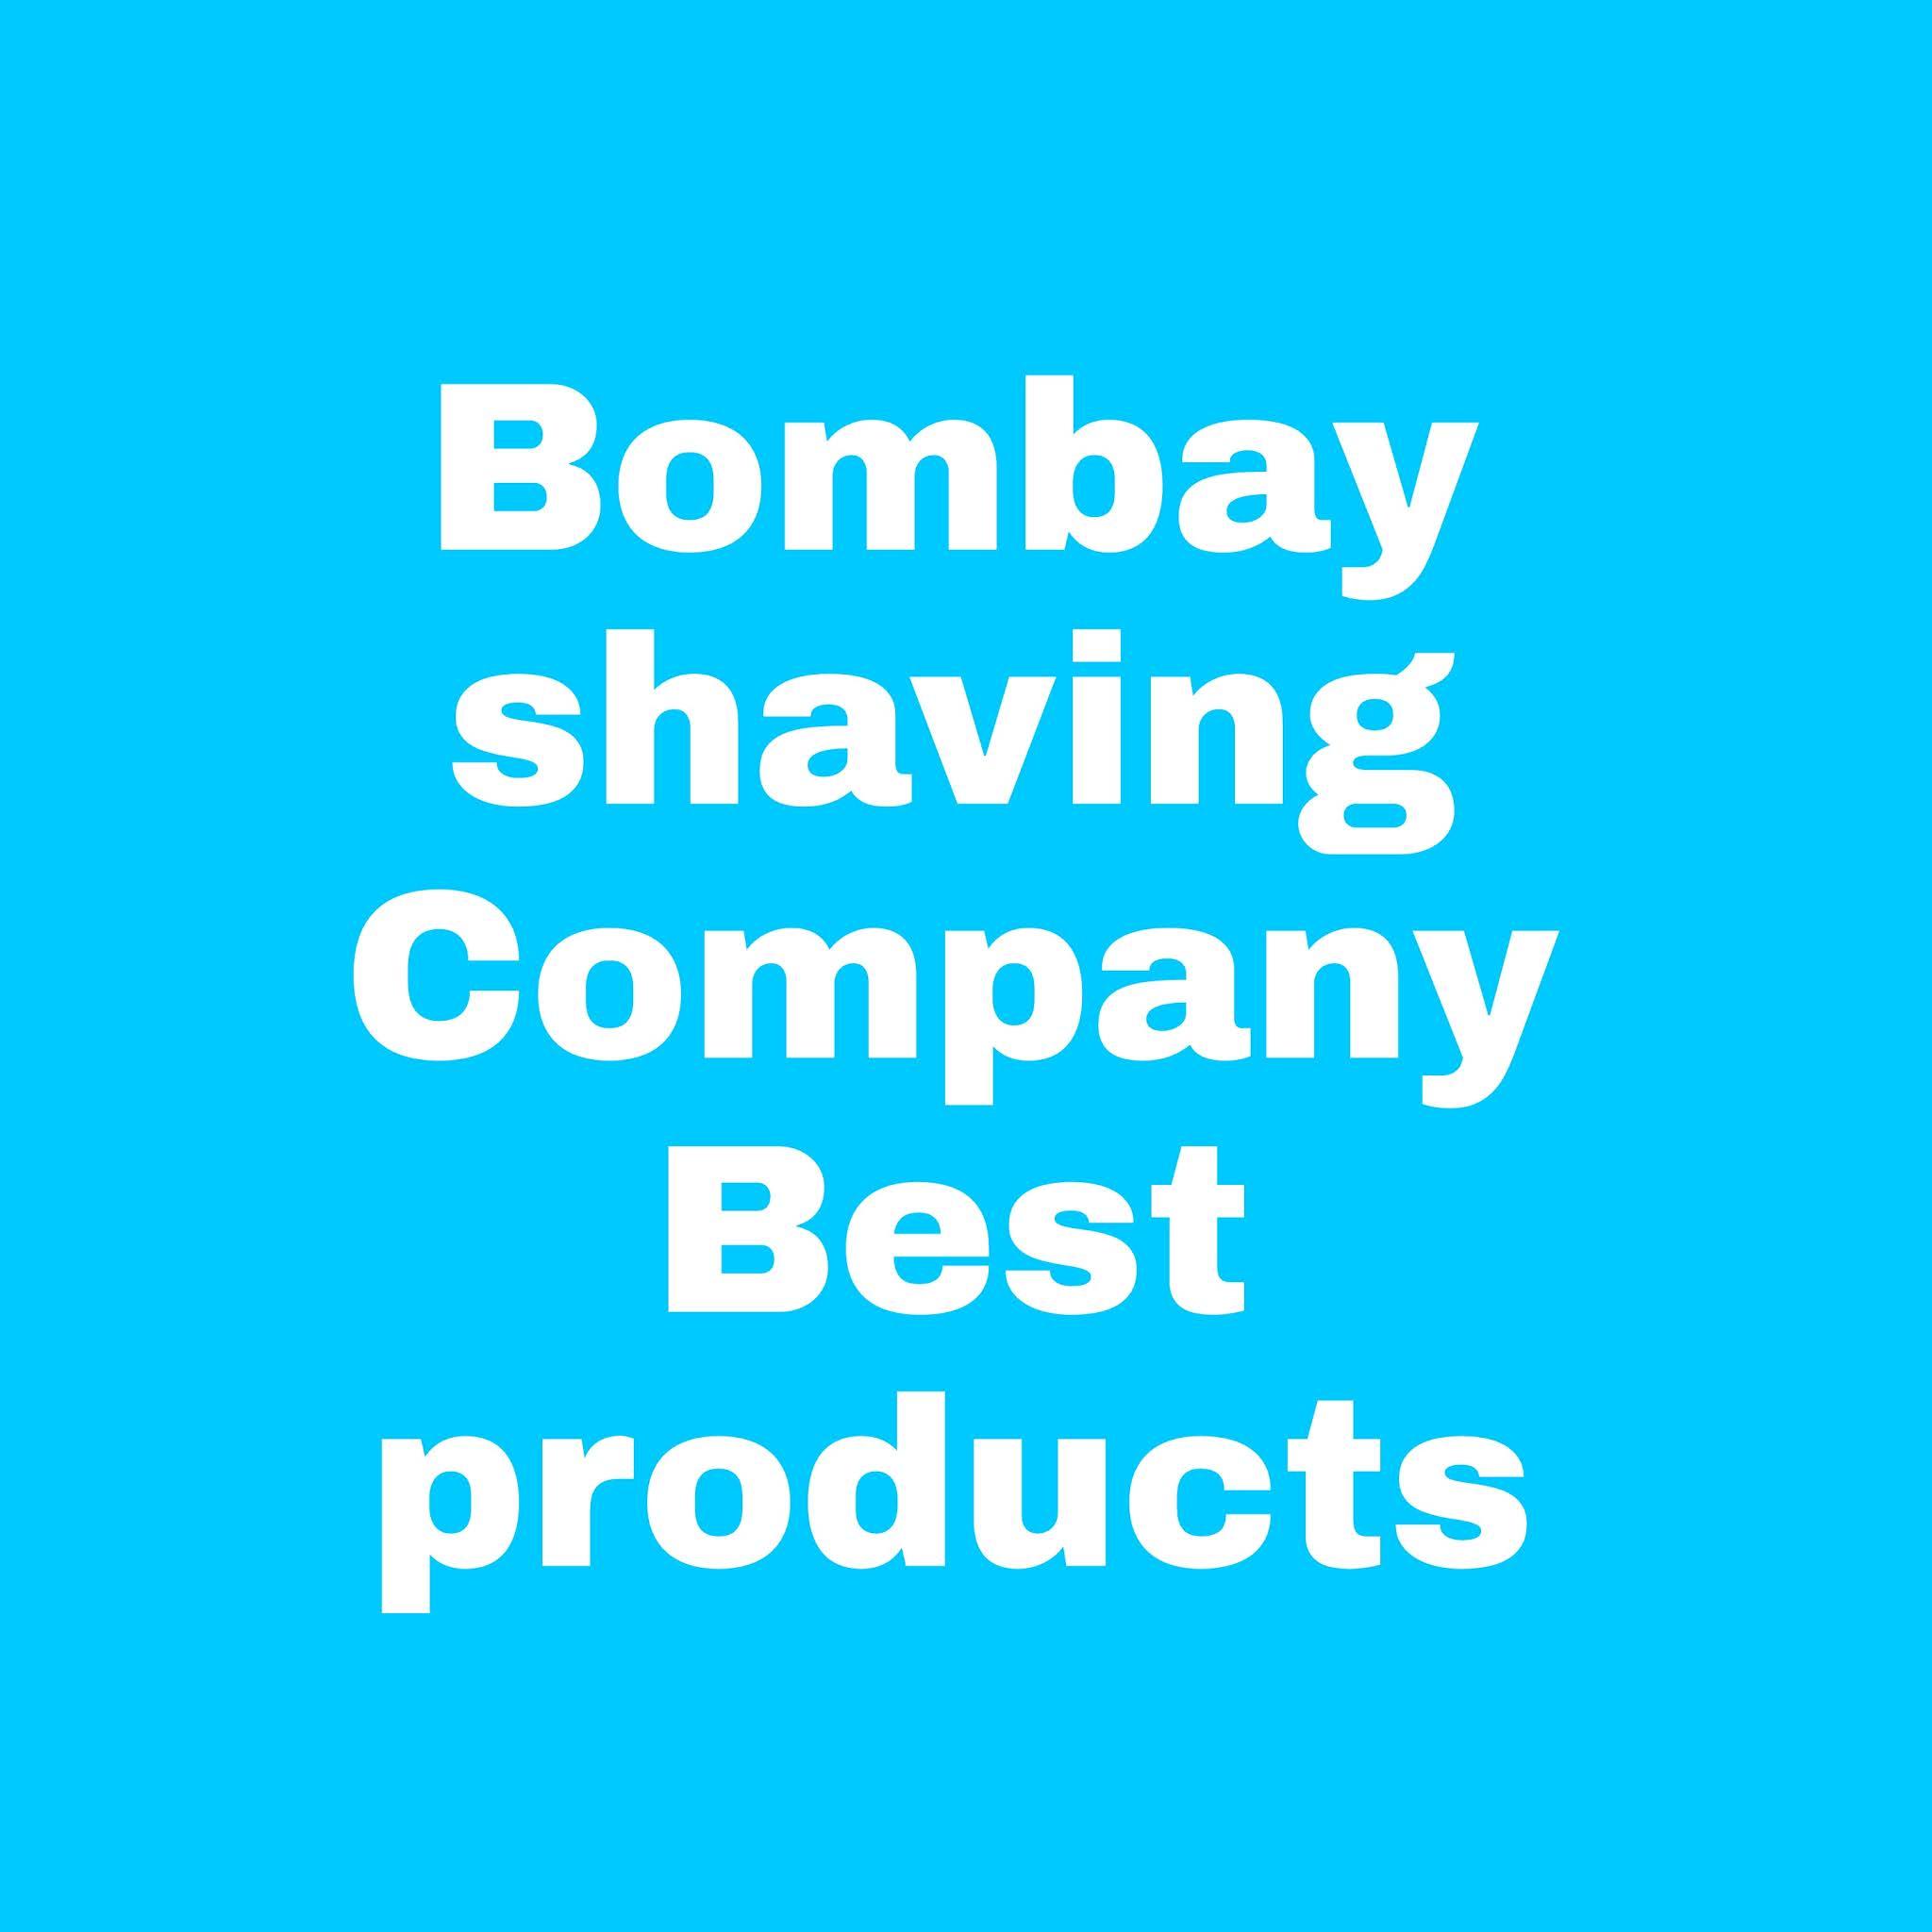 Best Bombay Shaving Company Products 2021